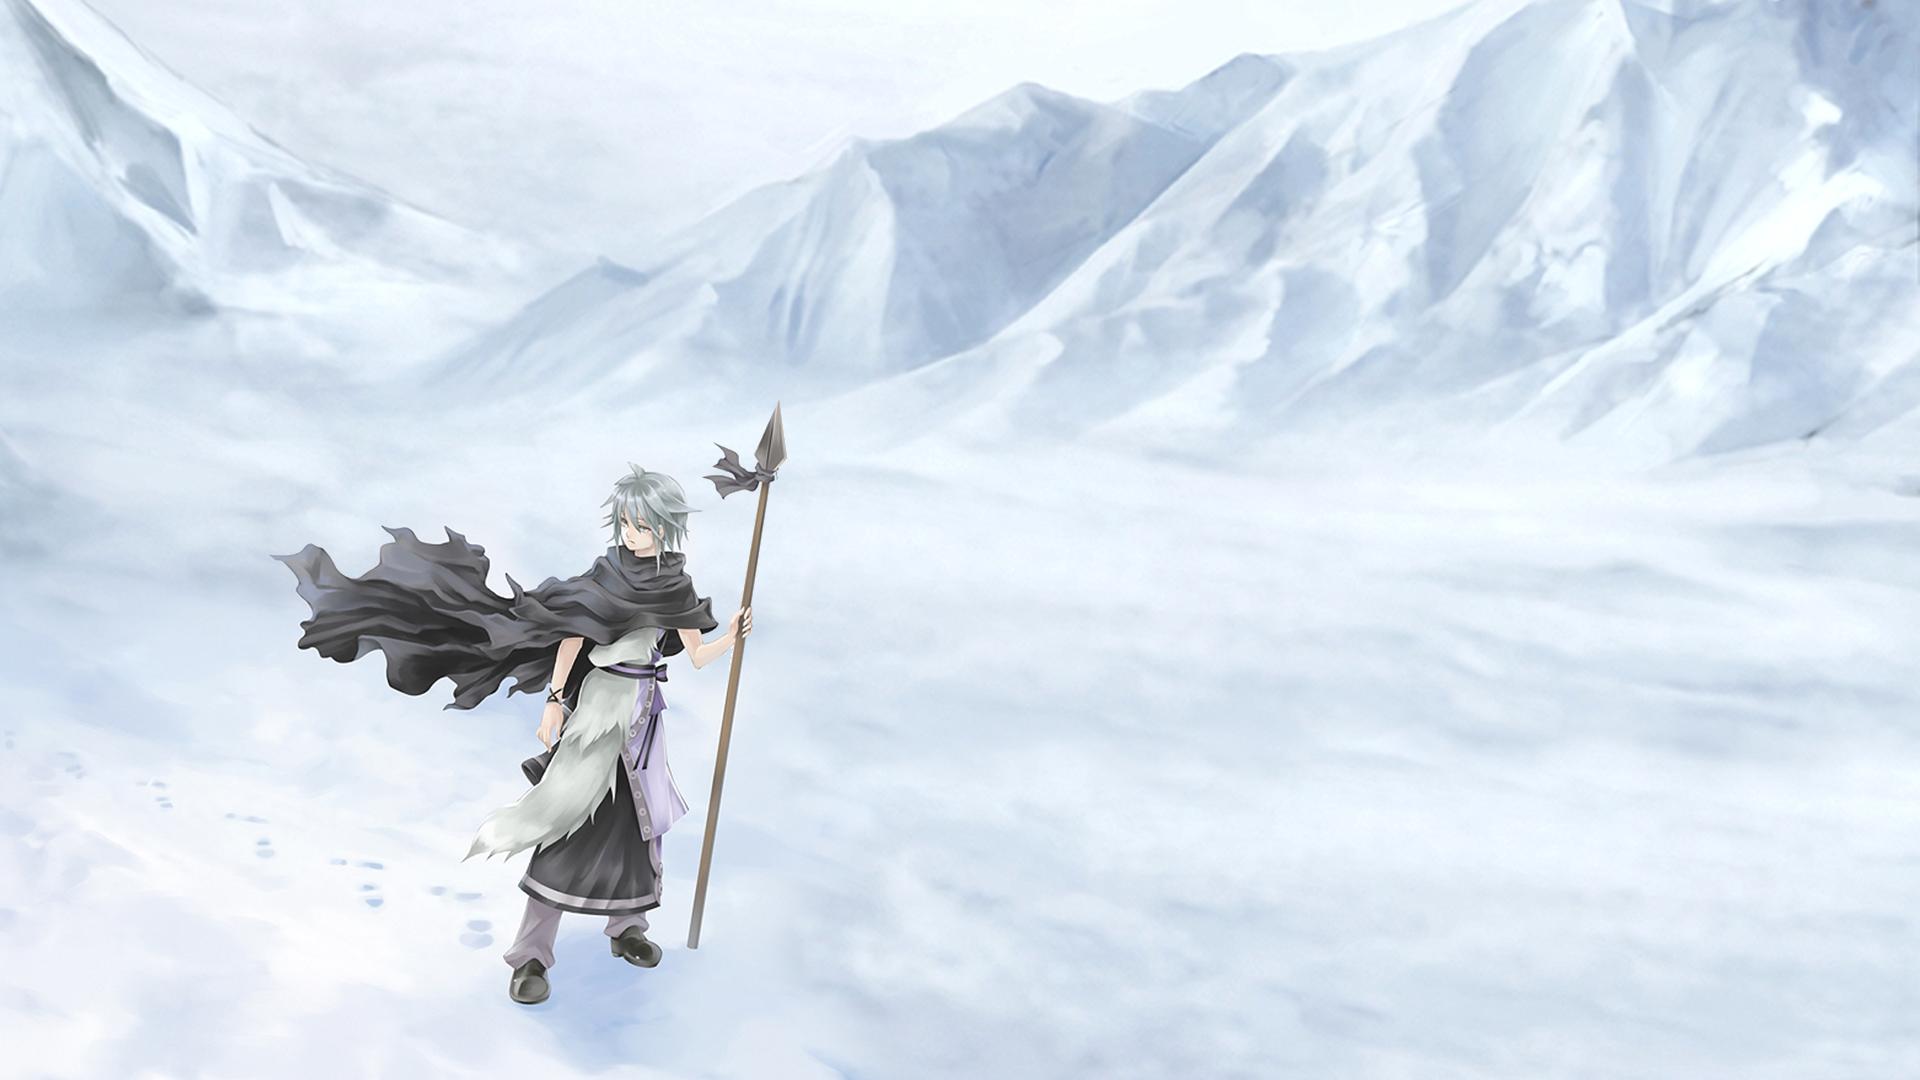 Wallpaper Yuras, Area-X video game